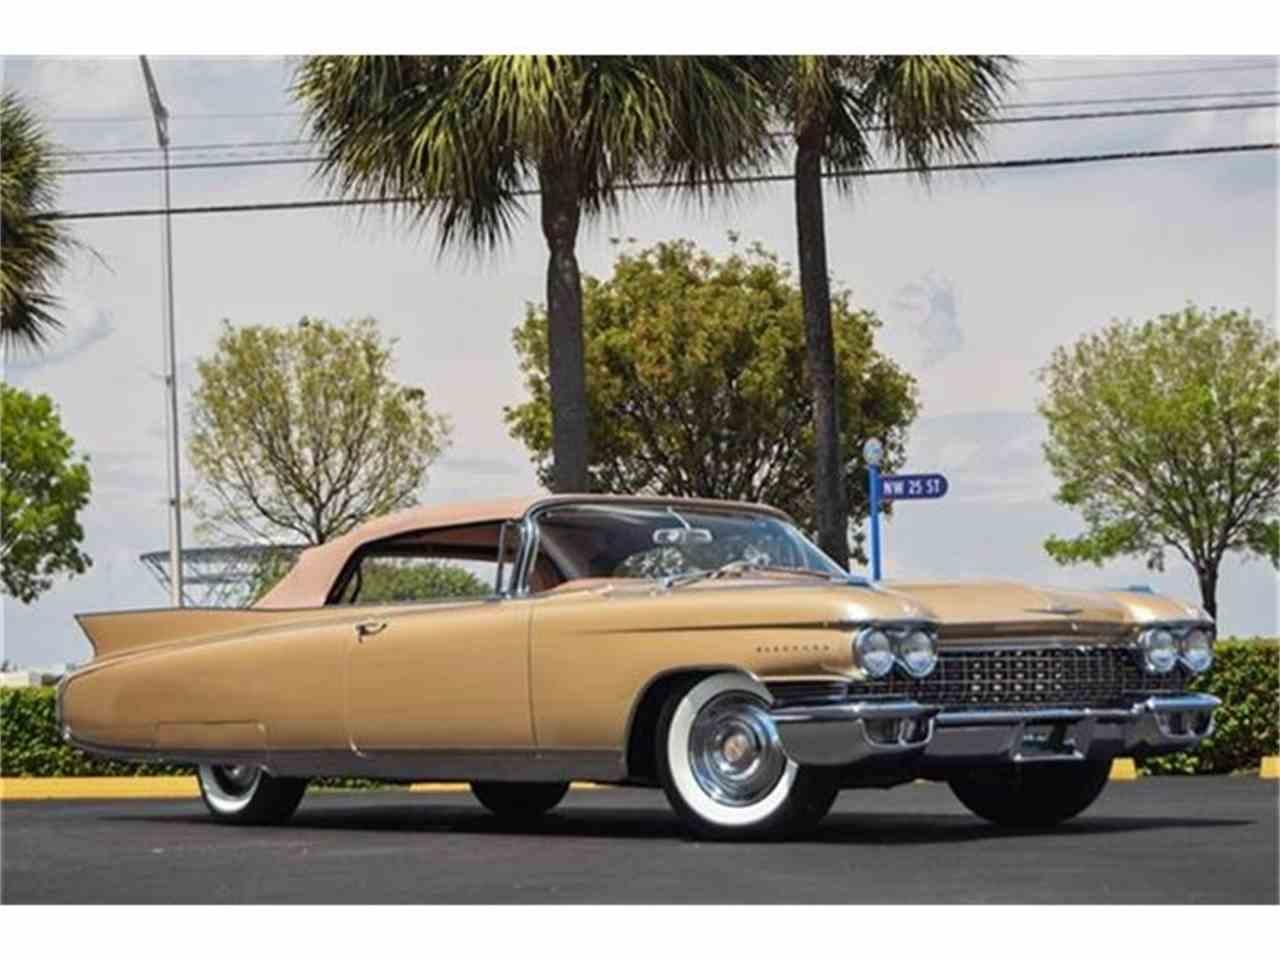 Cadillac Eldorado Biarritz For Sale ClassicCarscom CC - Cadillac dealer miami